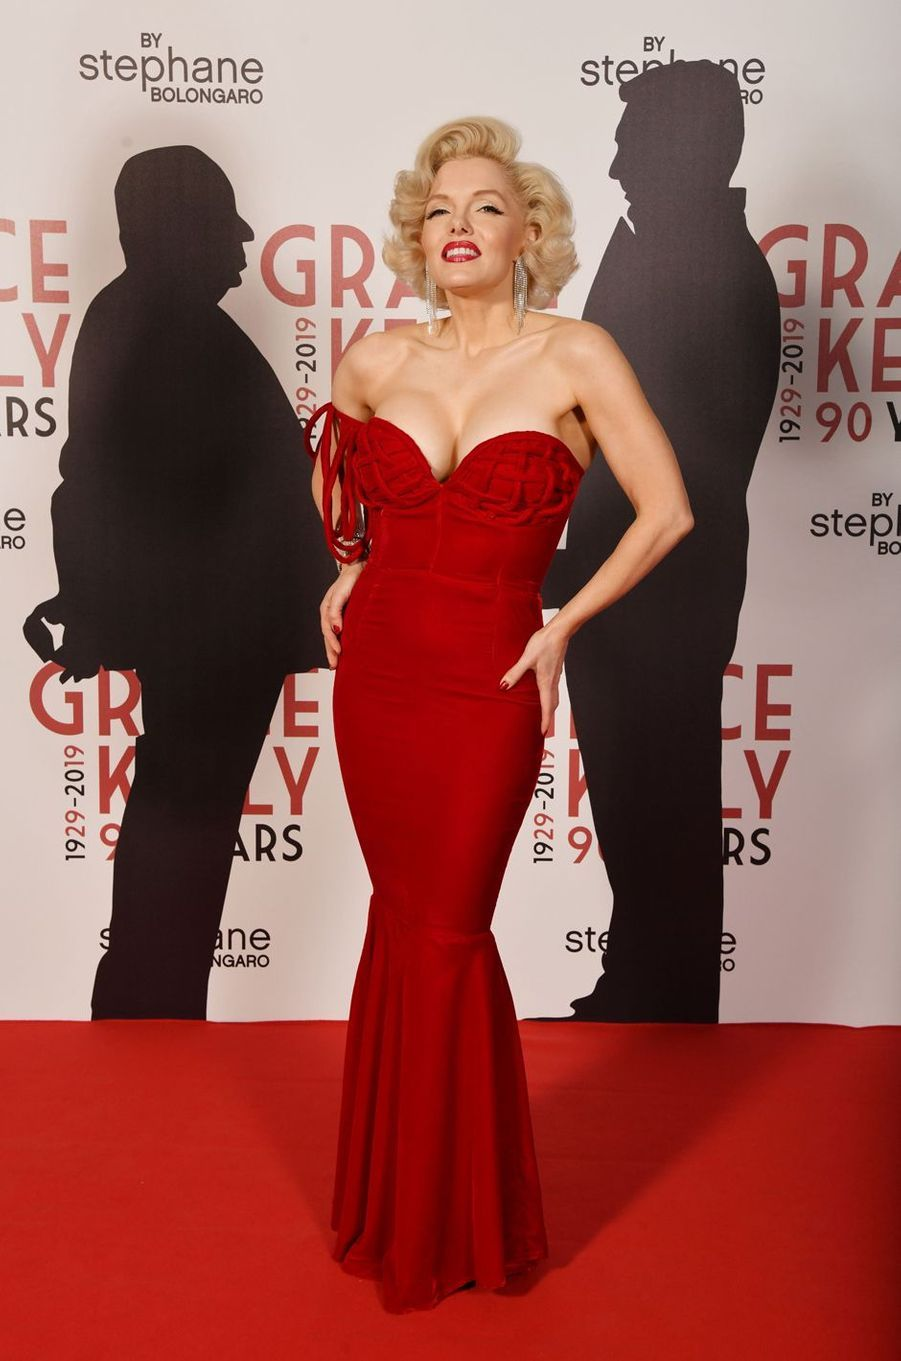 Un sosie de Marilyn Monroe à Monaco, le 18 avril 2019